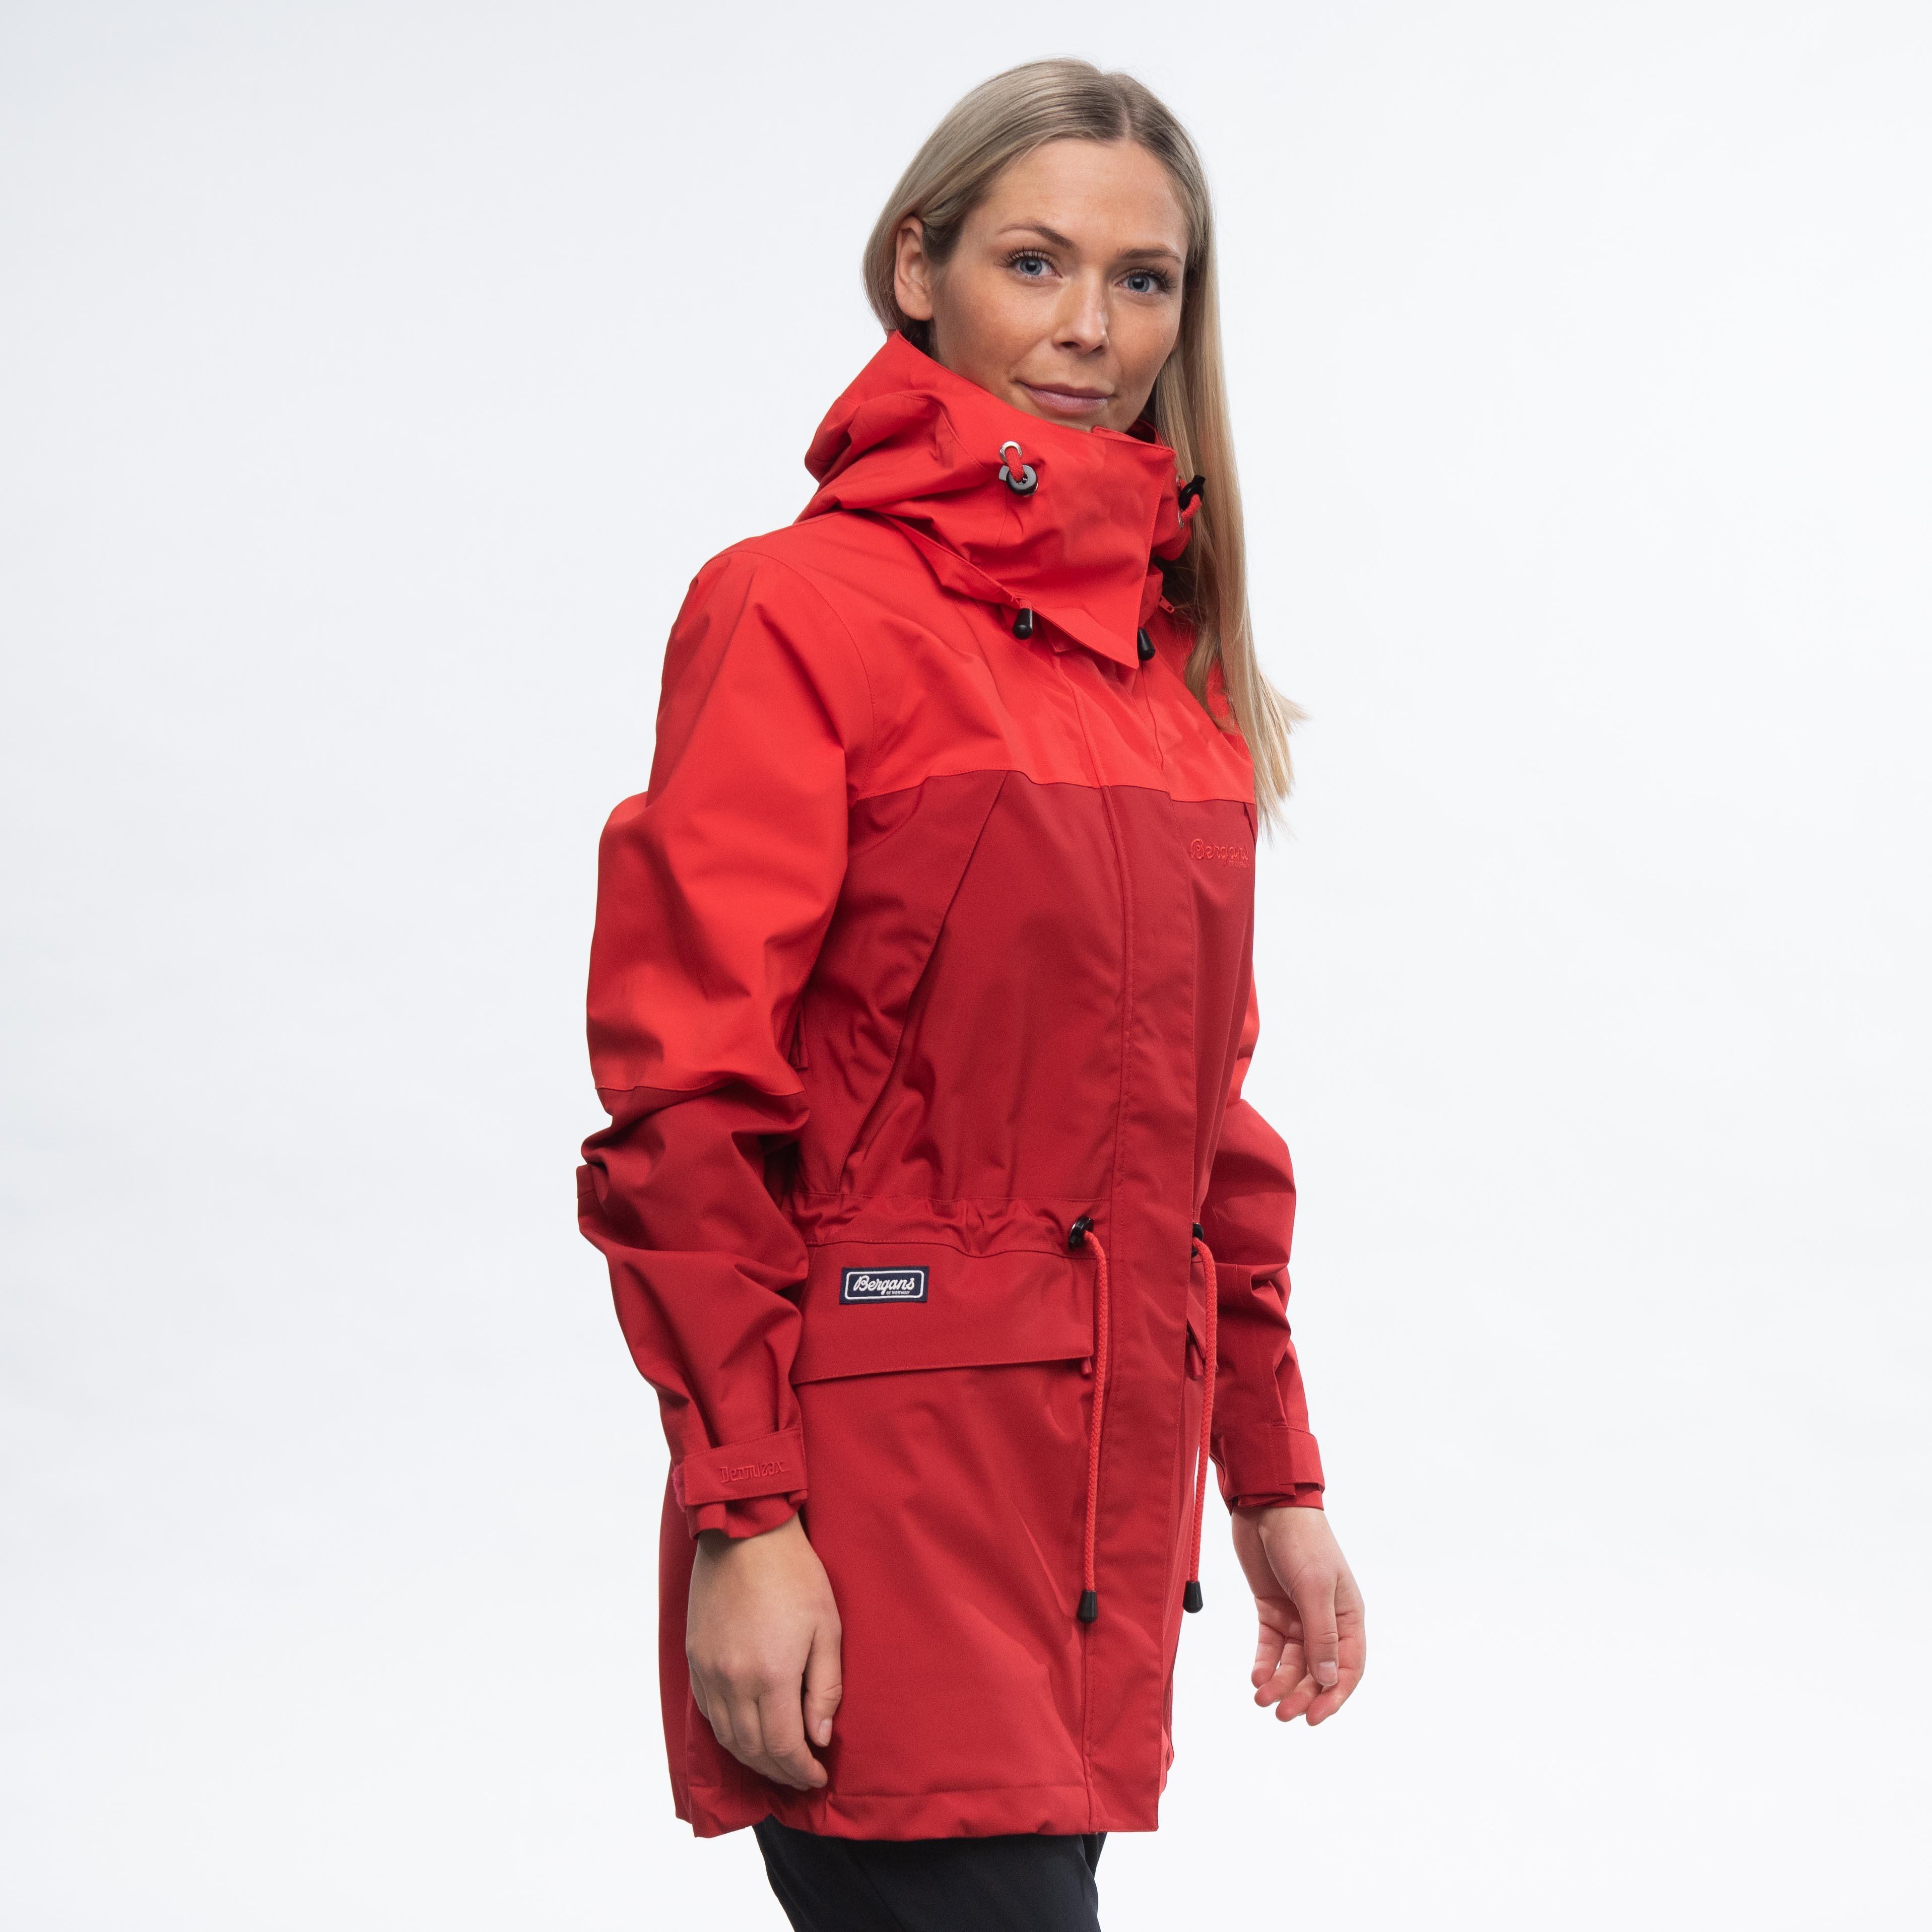 Breheimen 2L W Jacket